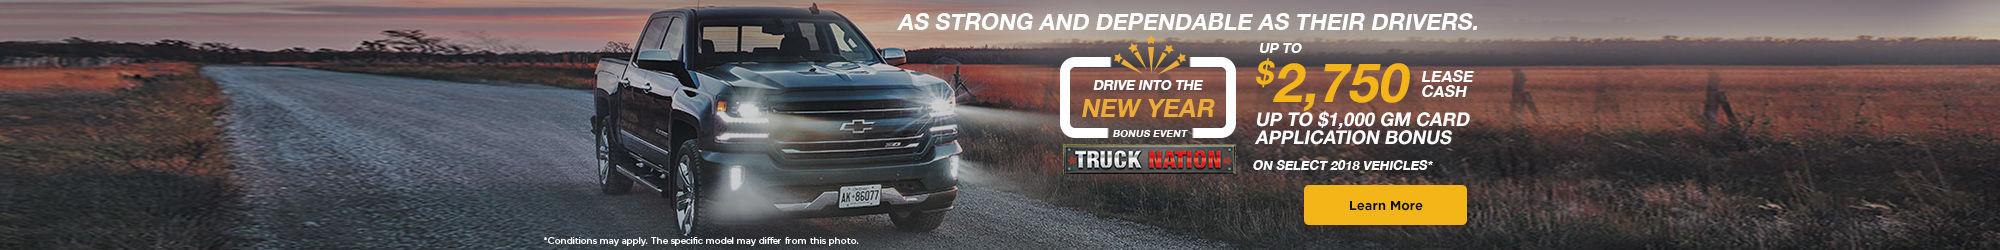 Drive Into the New Year Bonus Event - Chevrolet